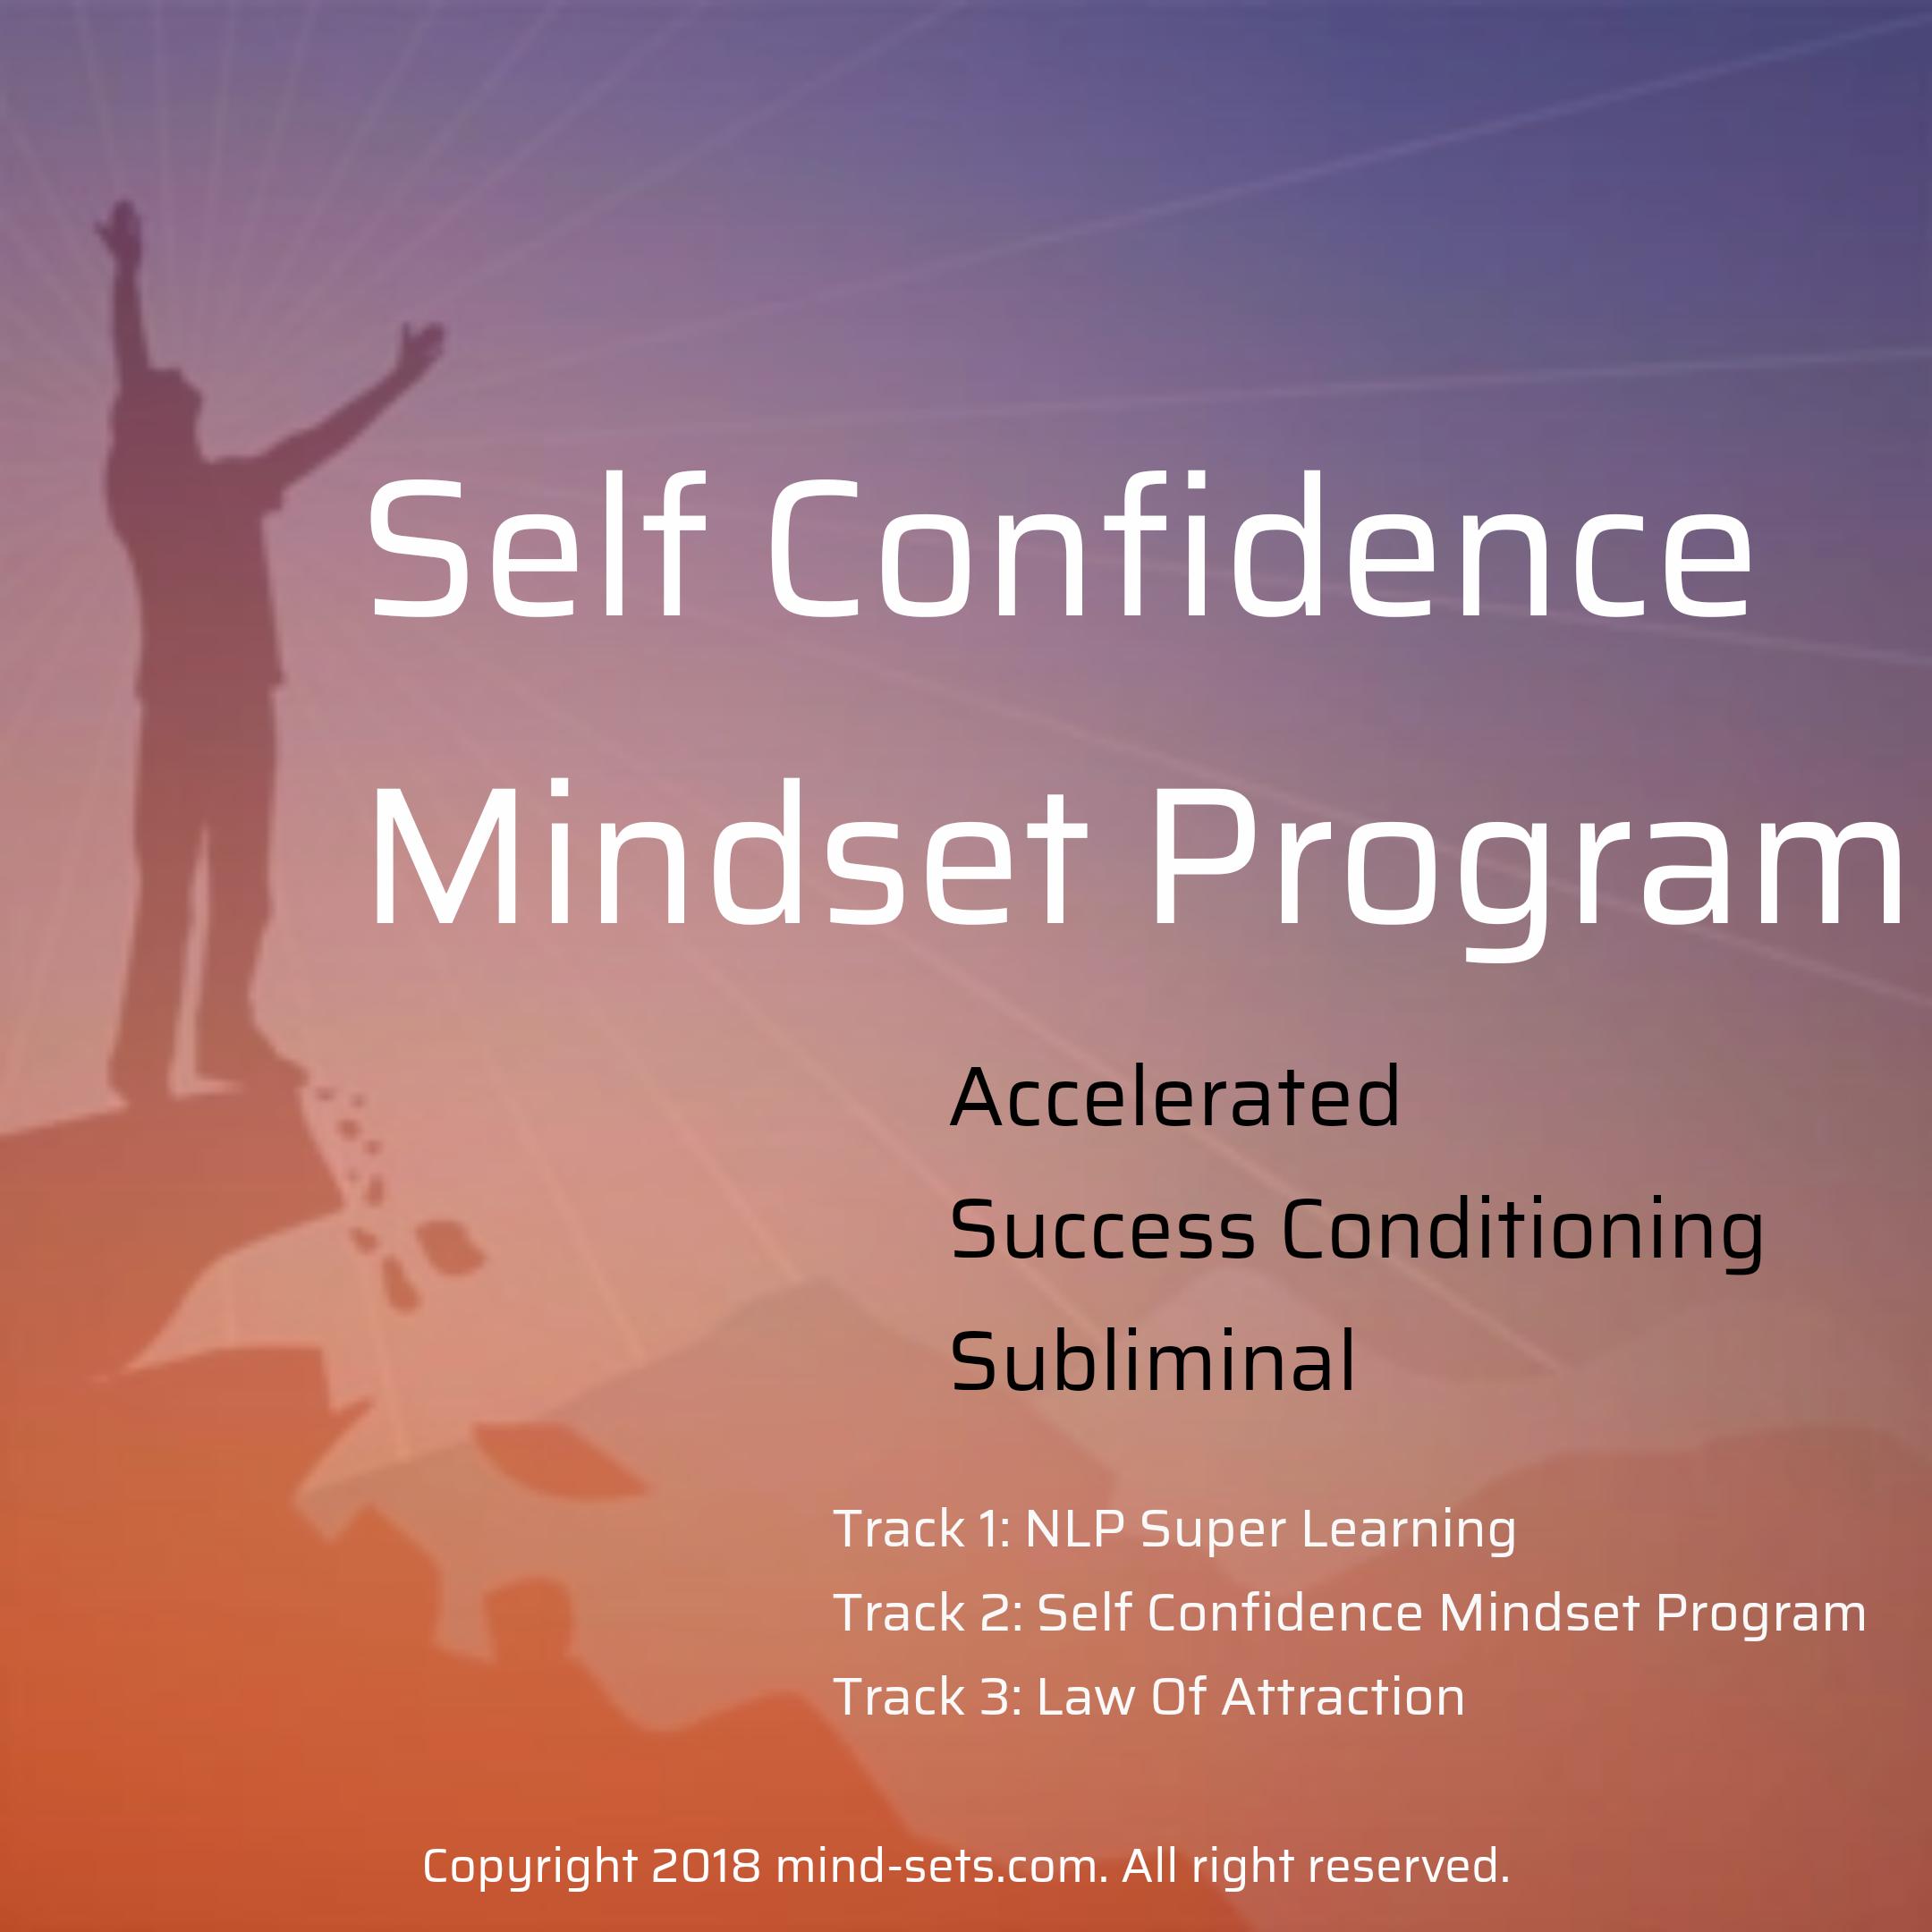 Self Confidence Mindset Program